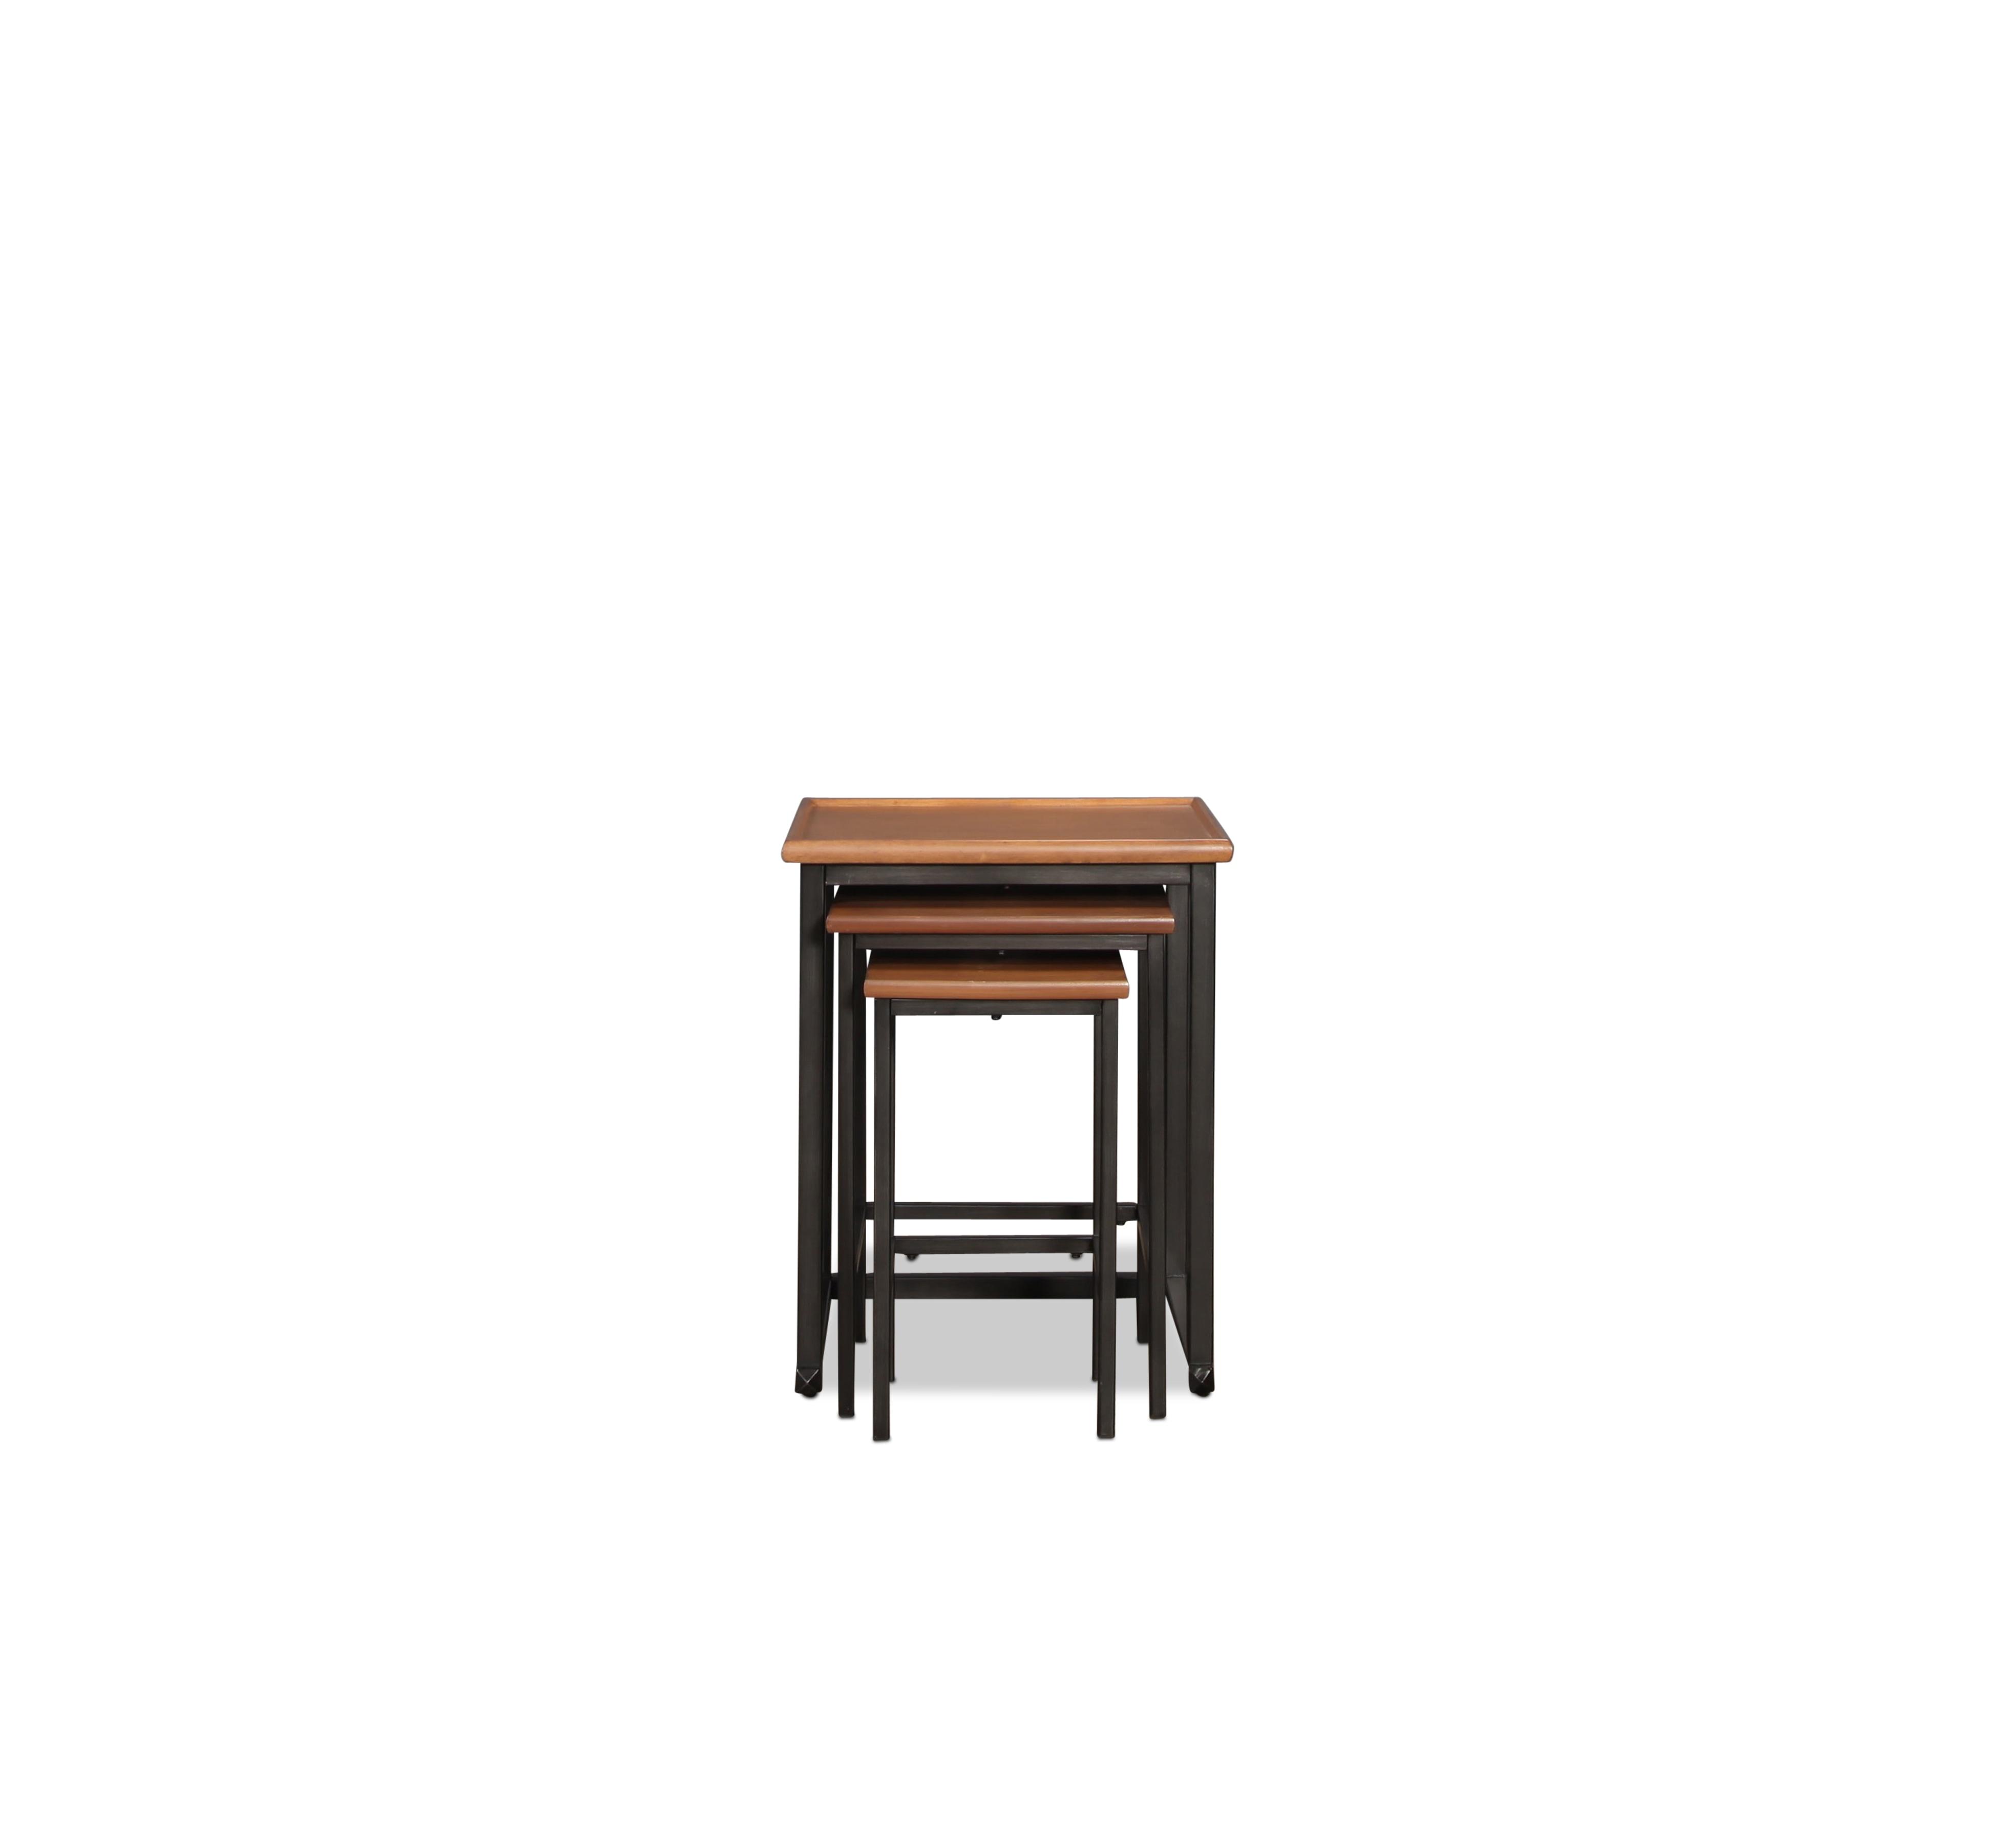 Barrow Nesting Tables - Medium Brown Pine